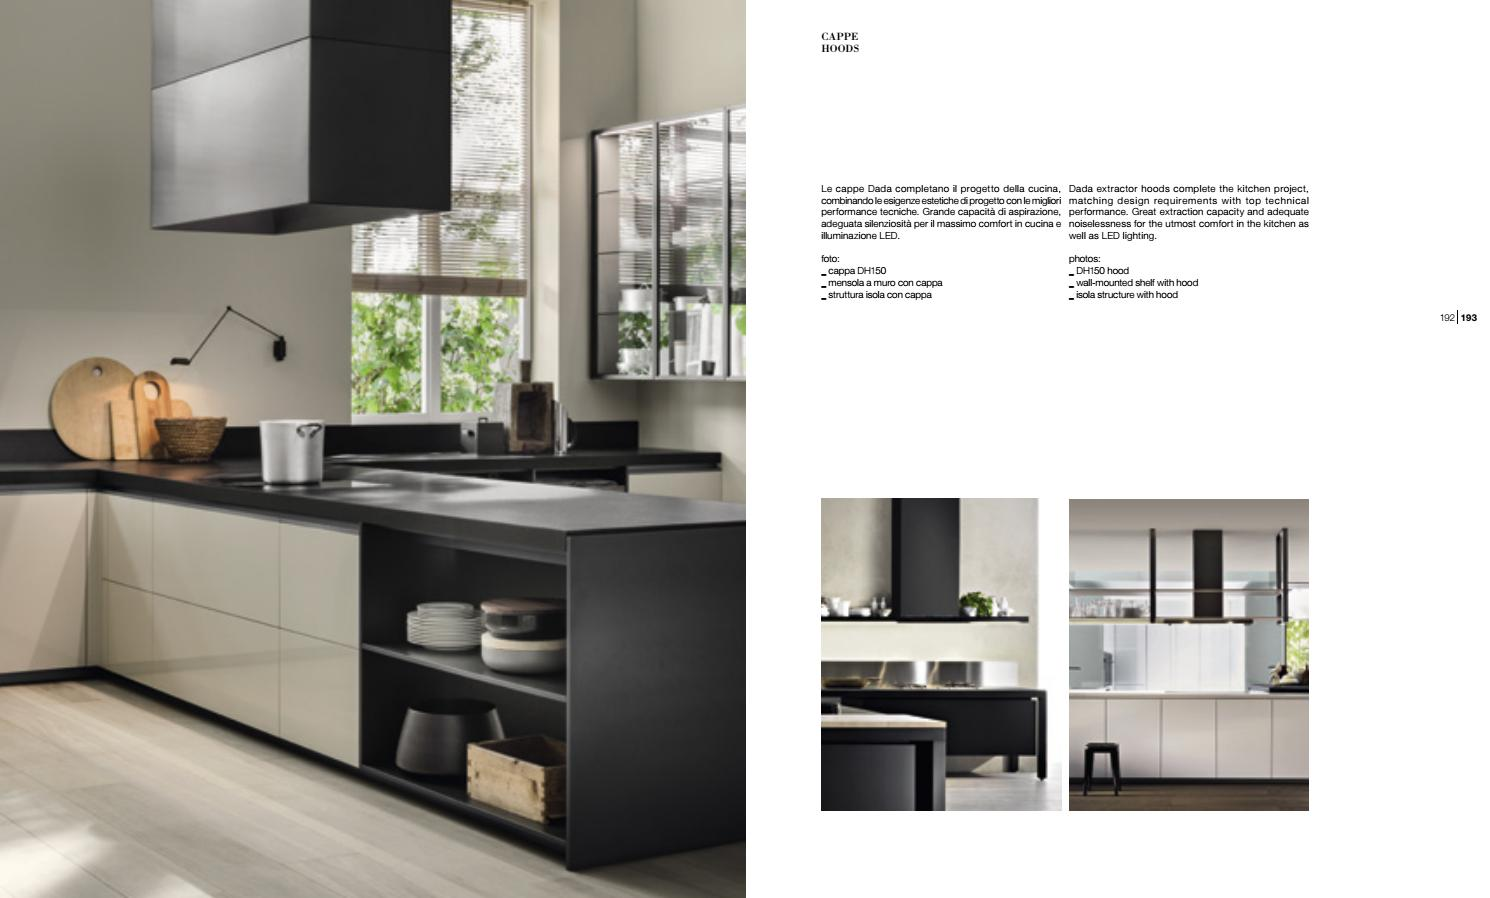 I Migliori Top Per Cucina dada - kitchen notes 4 catalog - interstudio by interstudio